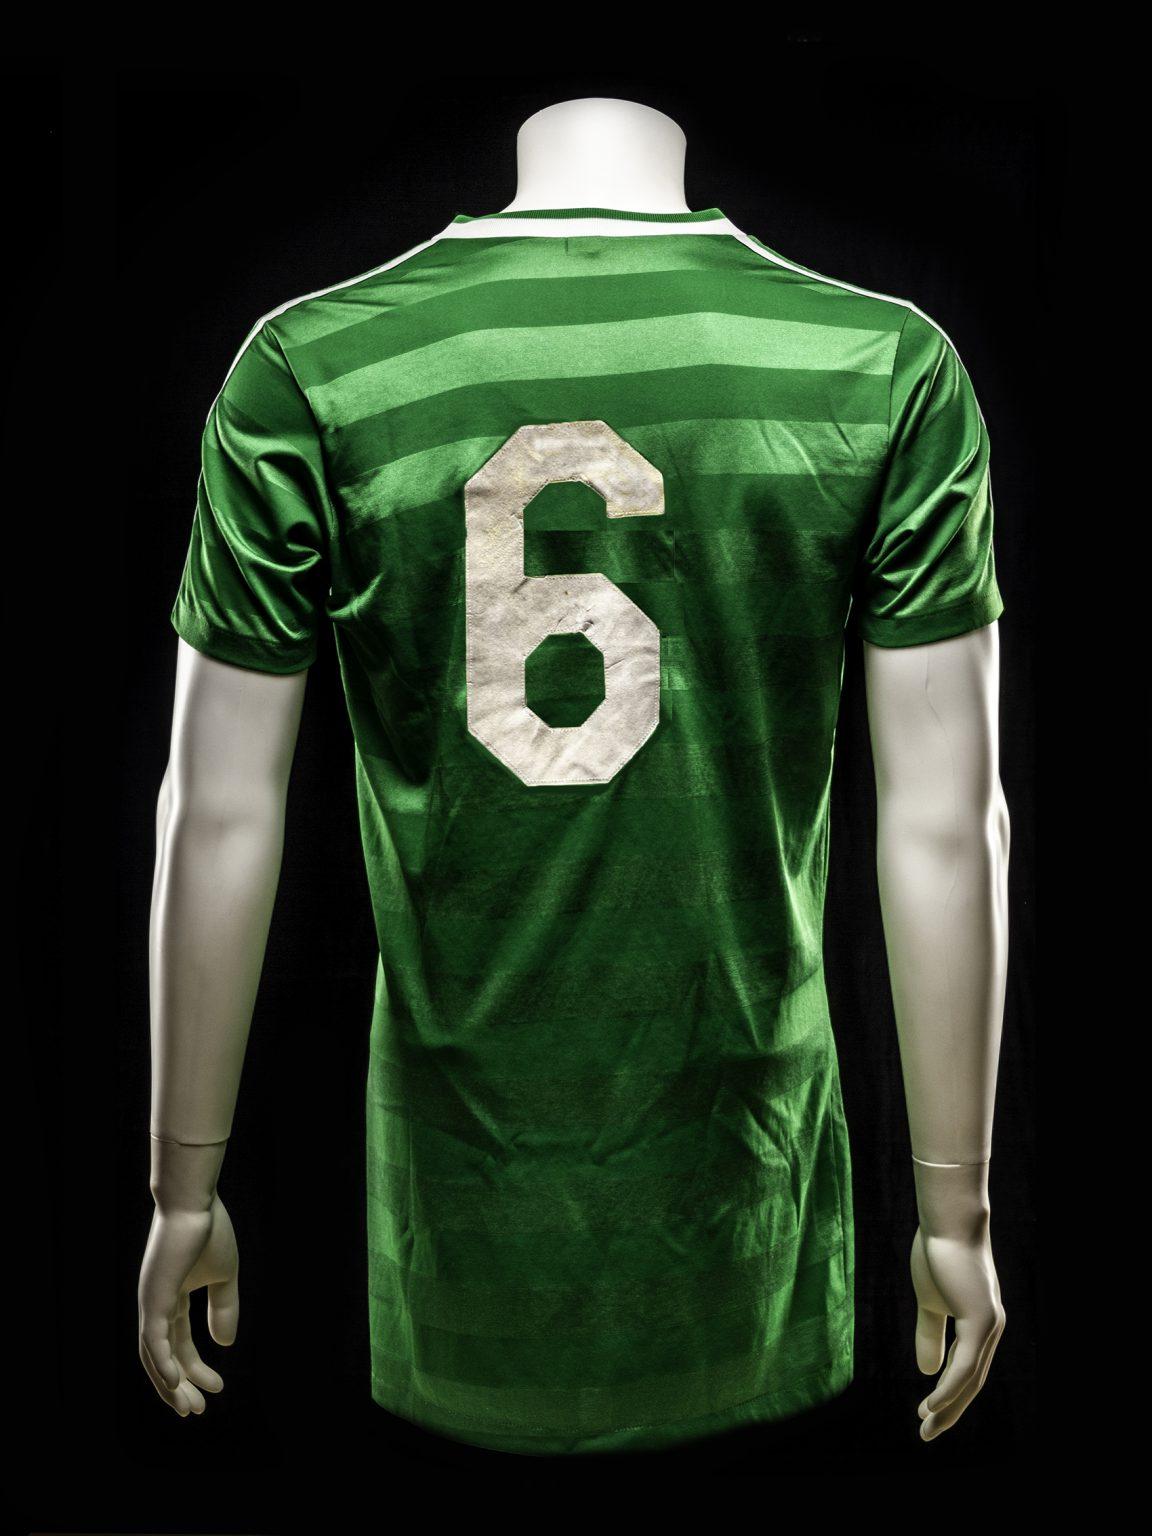 #6 FC Wageningen Martin Laamers